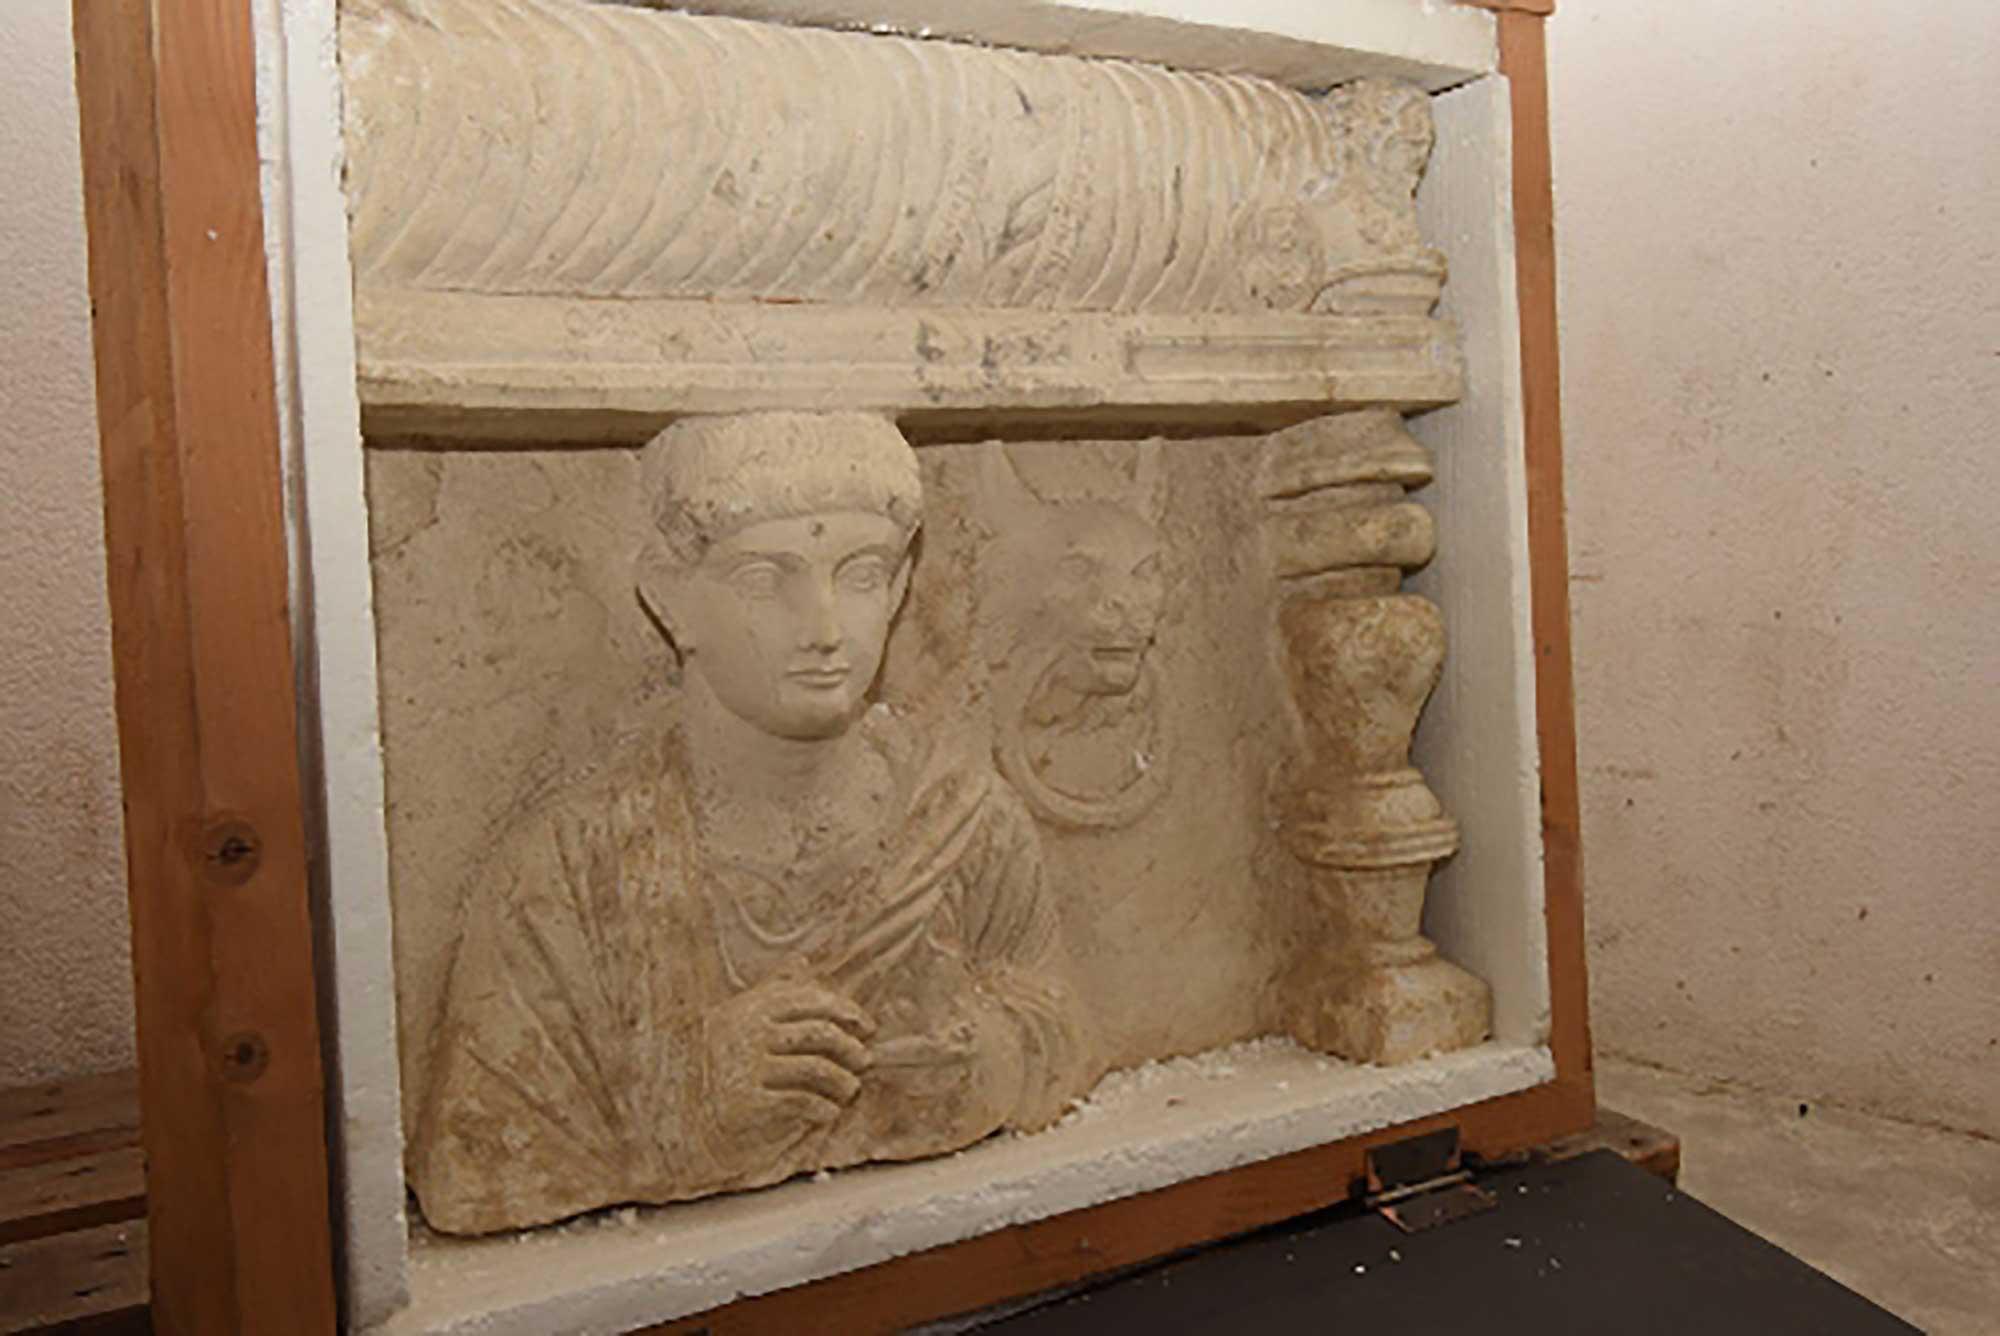 PÚBLICO - Justiça suíça confisca relíquias saqueadas de Palmira